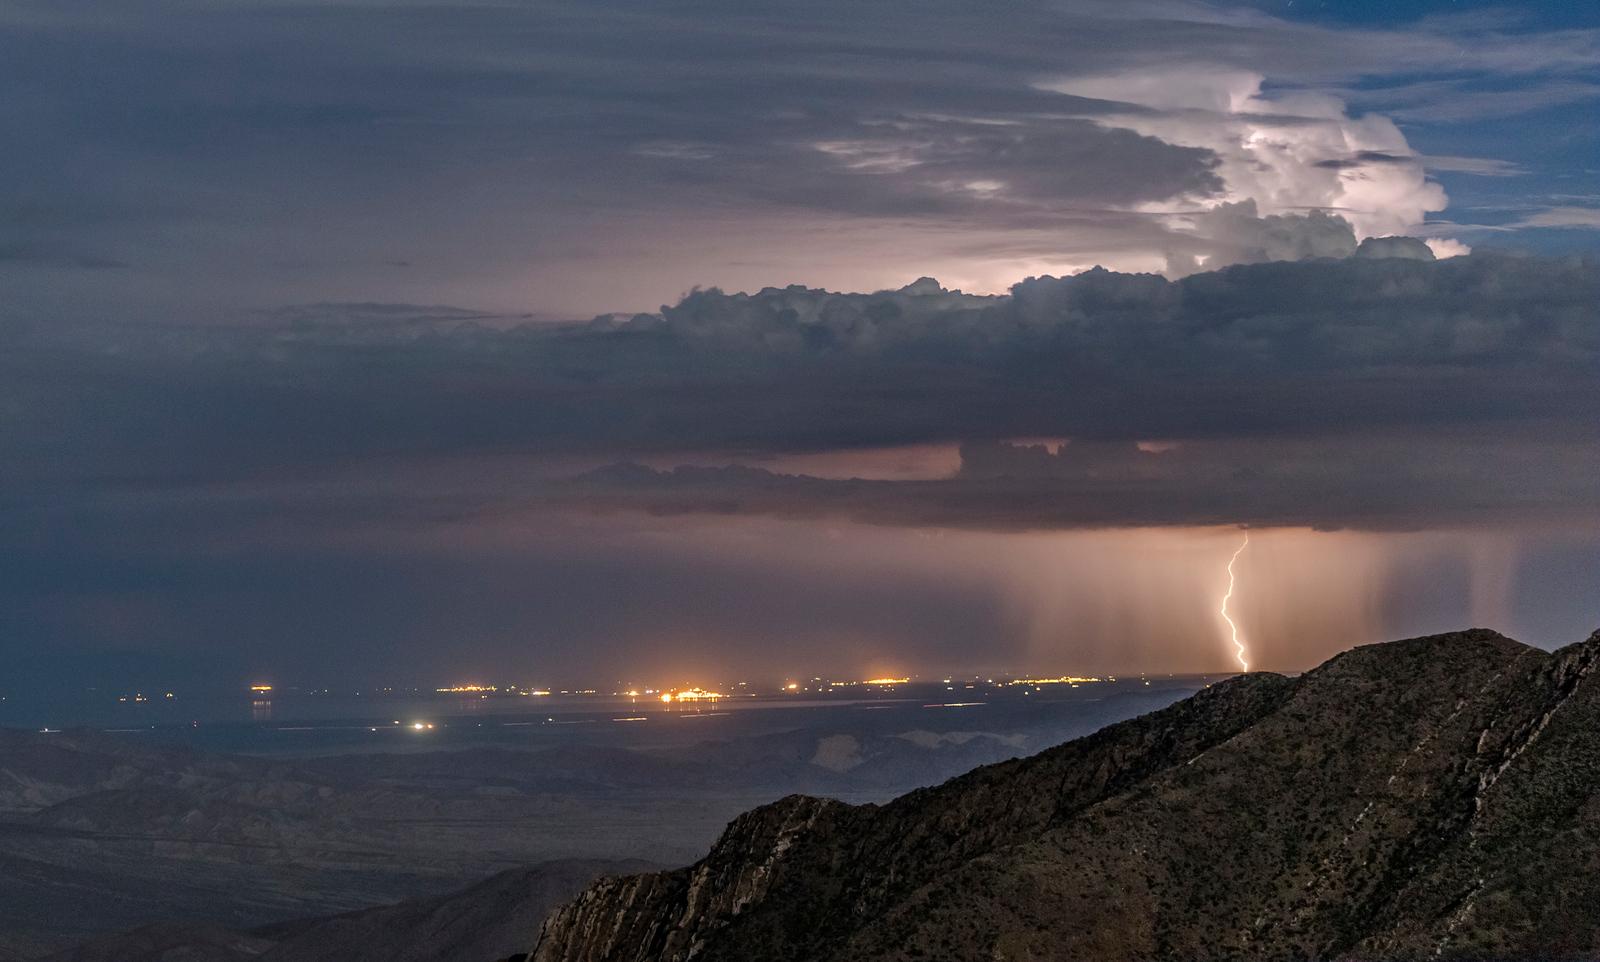 Lightning bolt and rain over Brawley and/or El Centro, California.